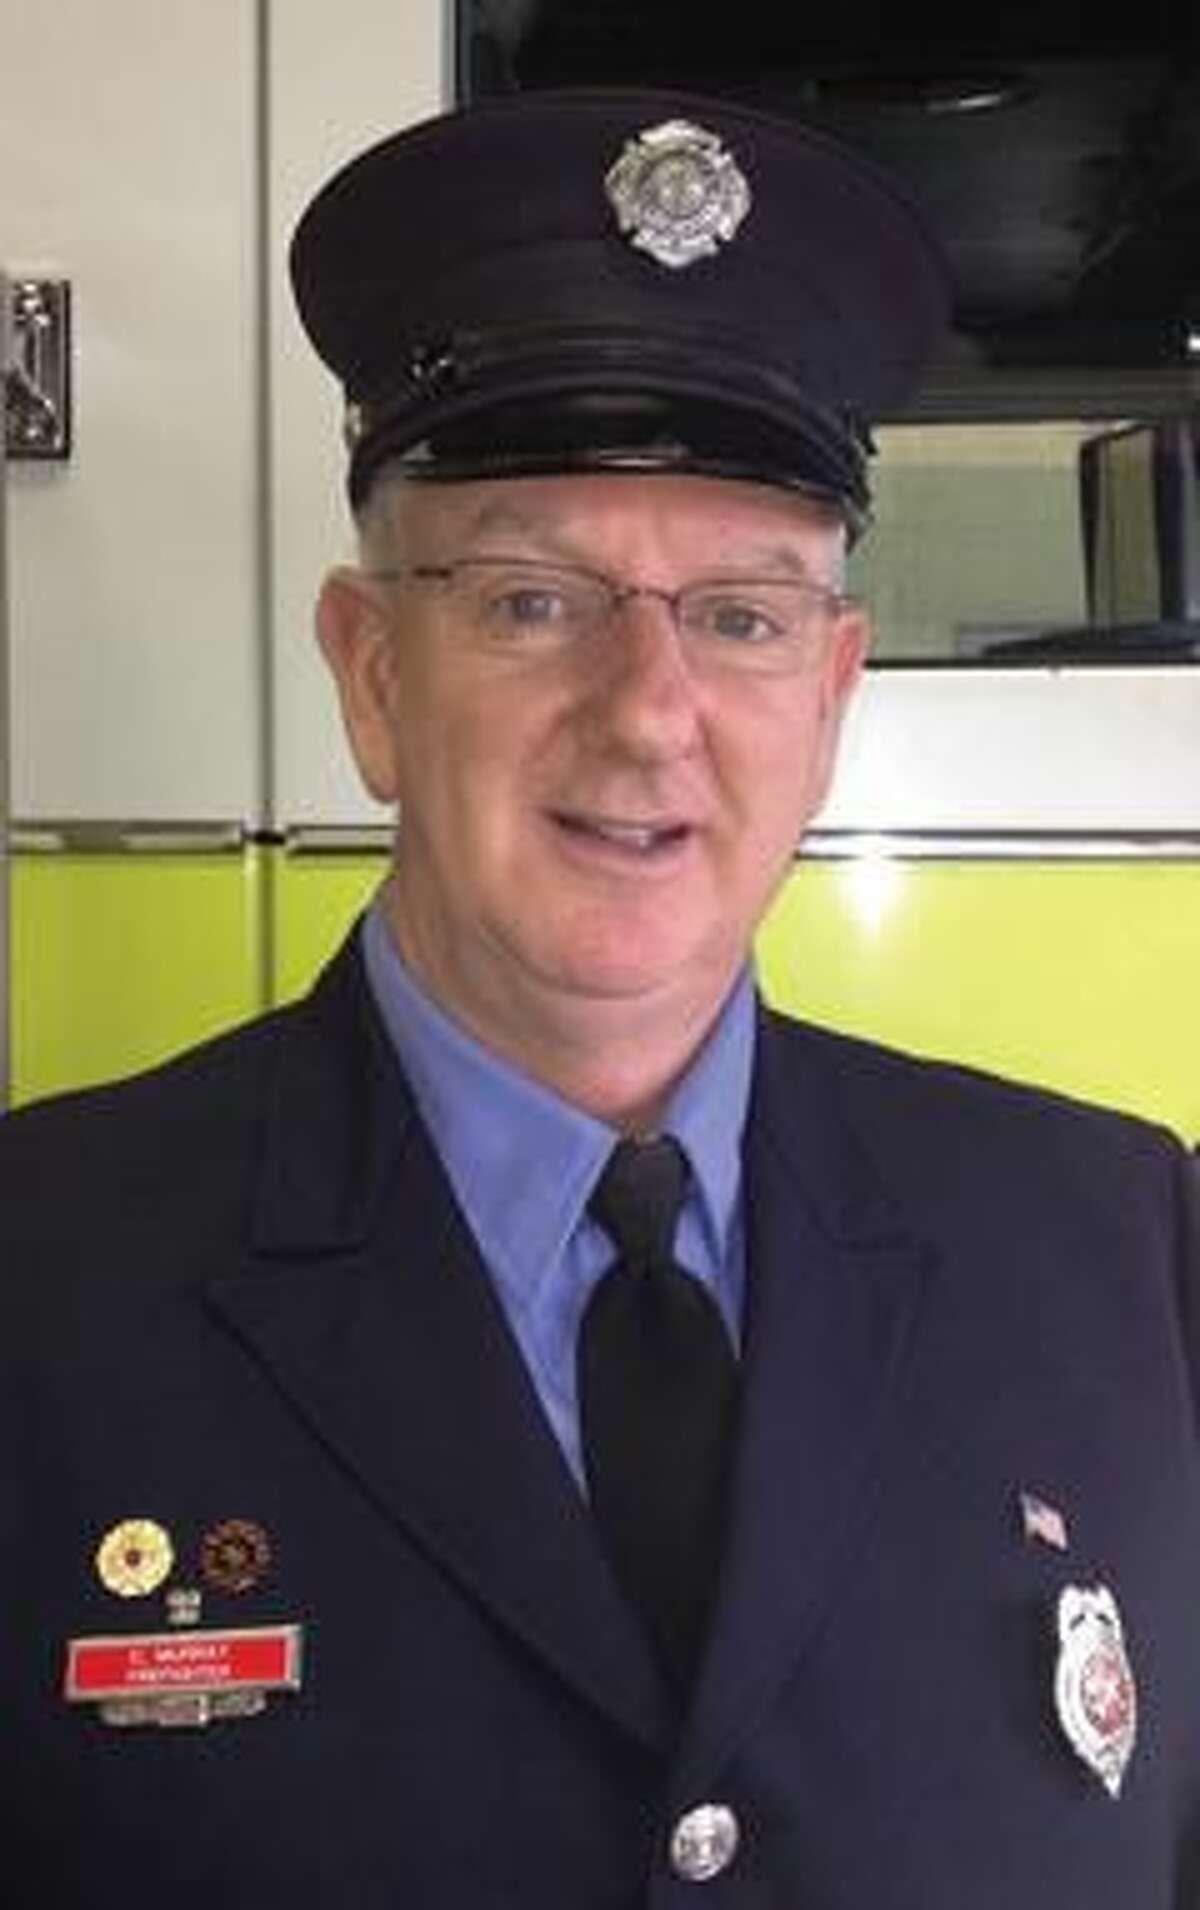 Firefighter Christopher Murray